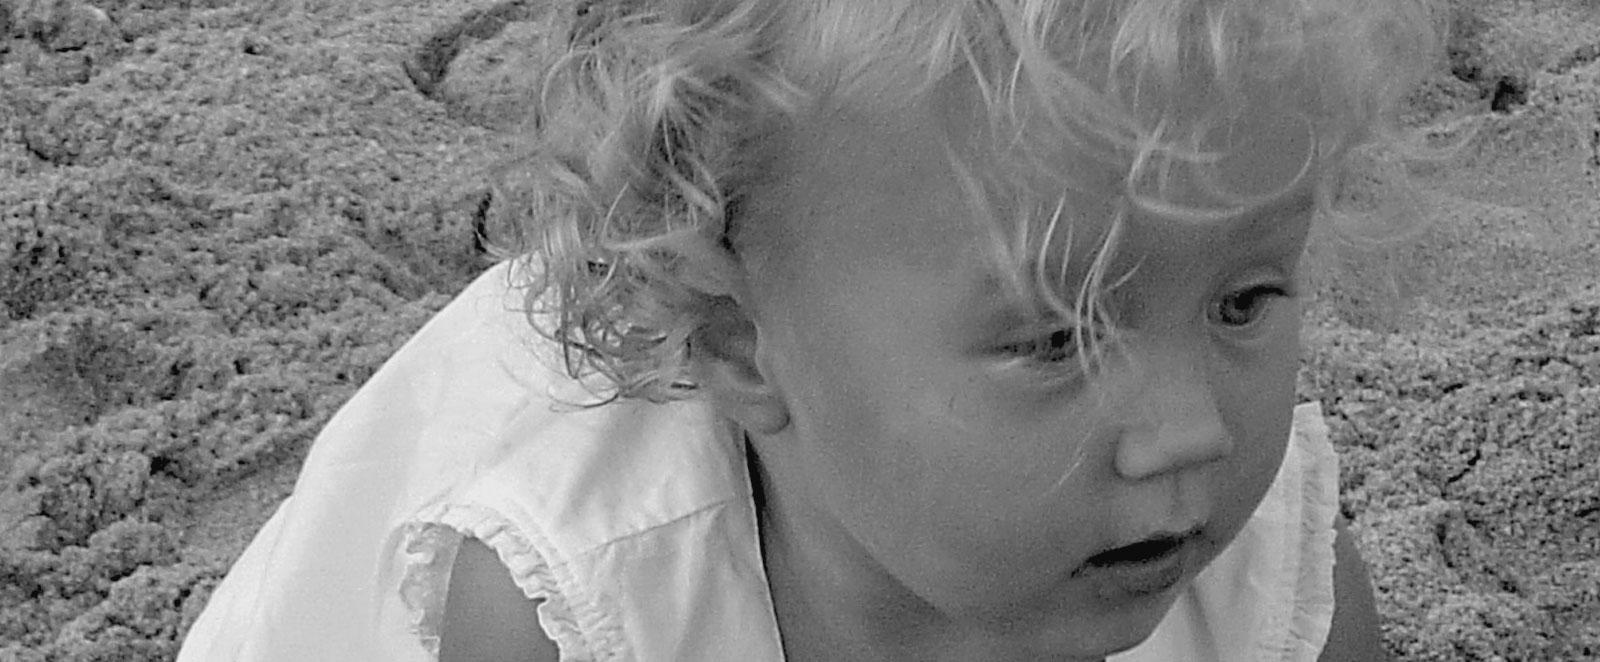 Emily's story – Emily Jerry Foundation